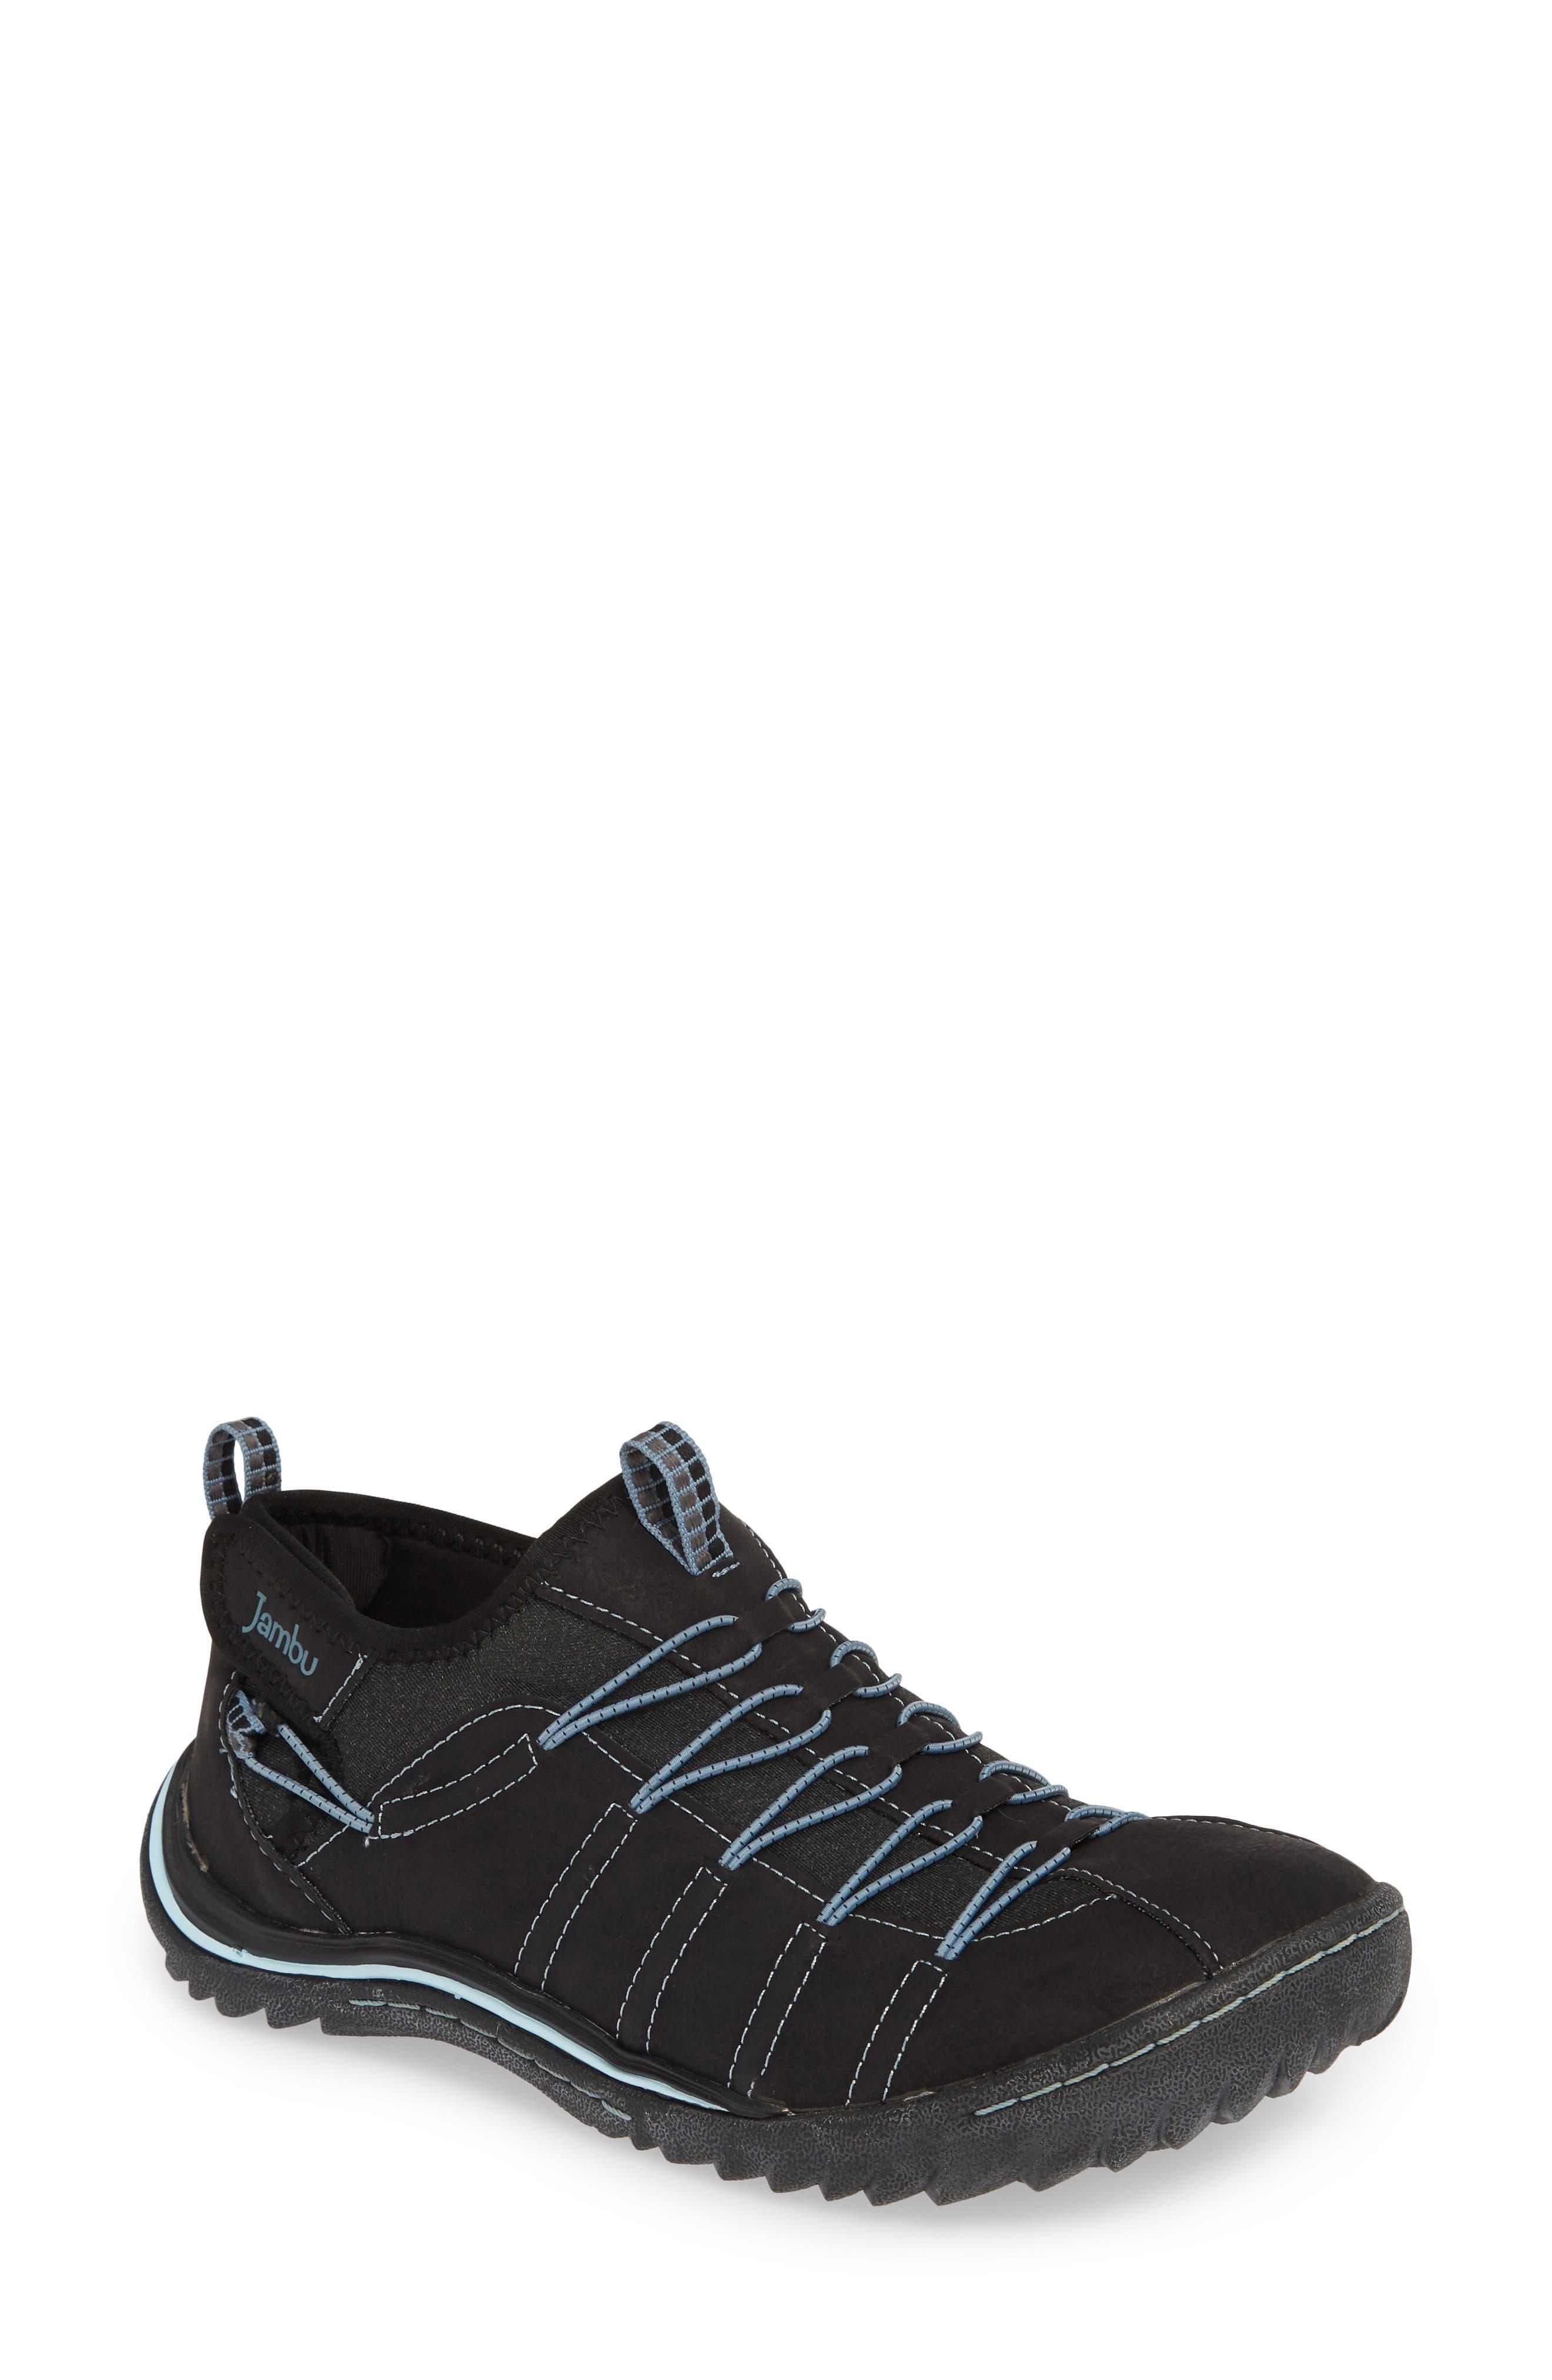 41ae6b58e27 Women s Sneakers   Athletic  Sale